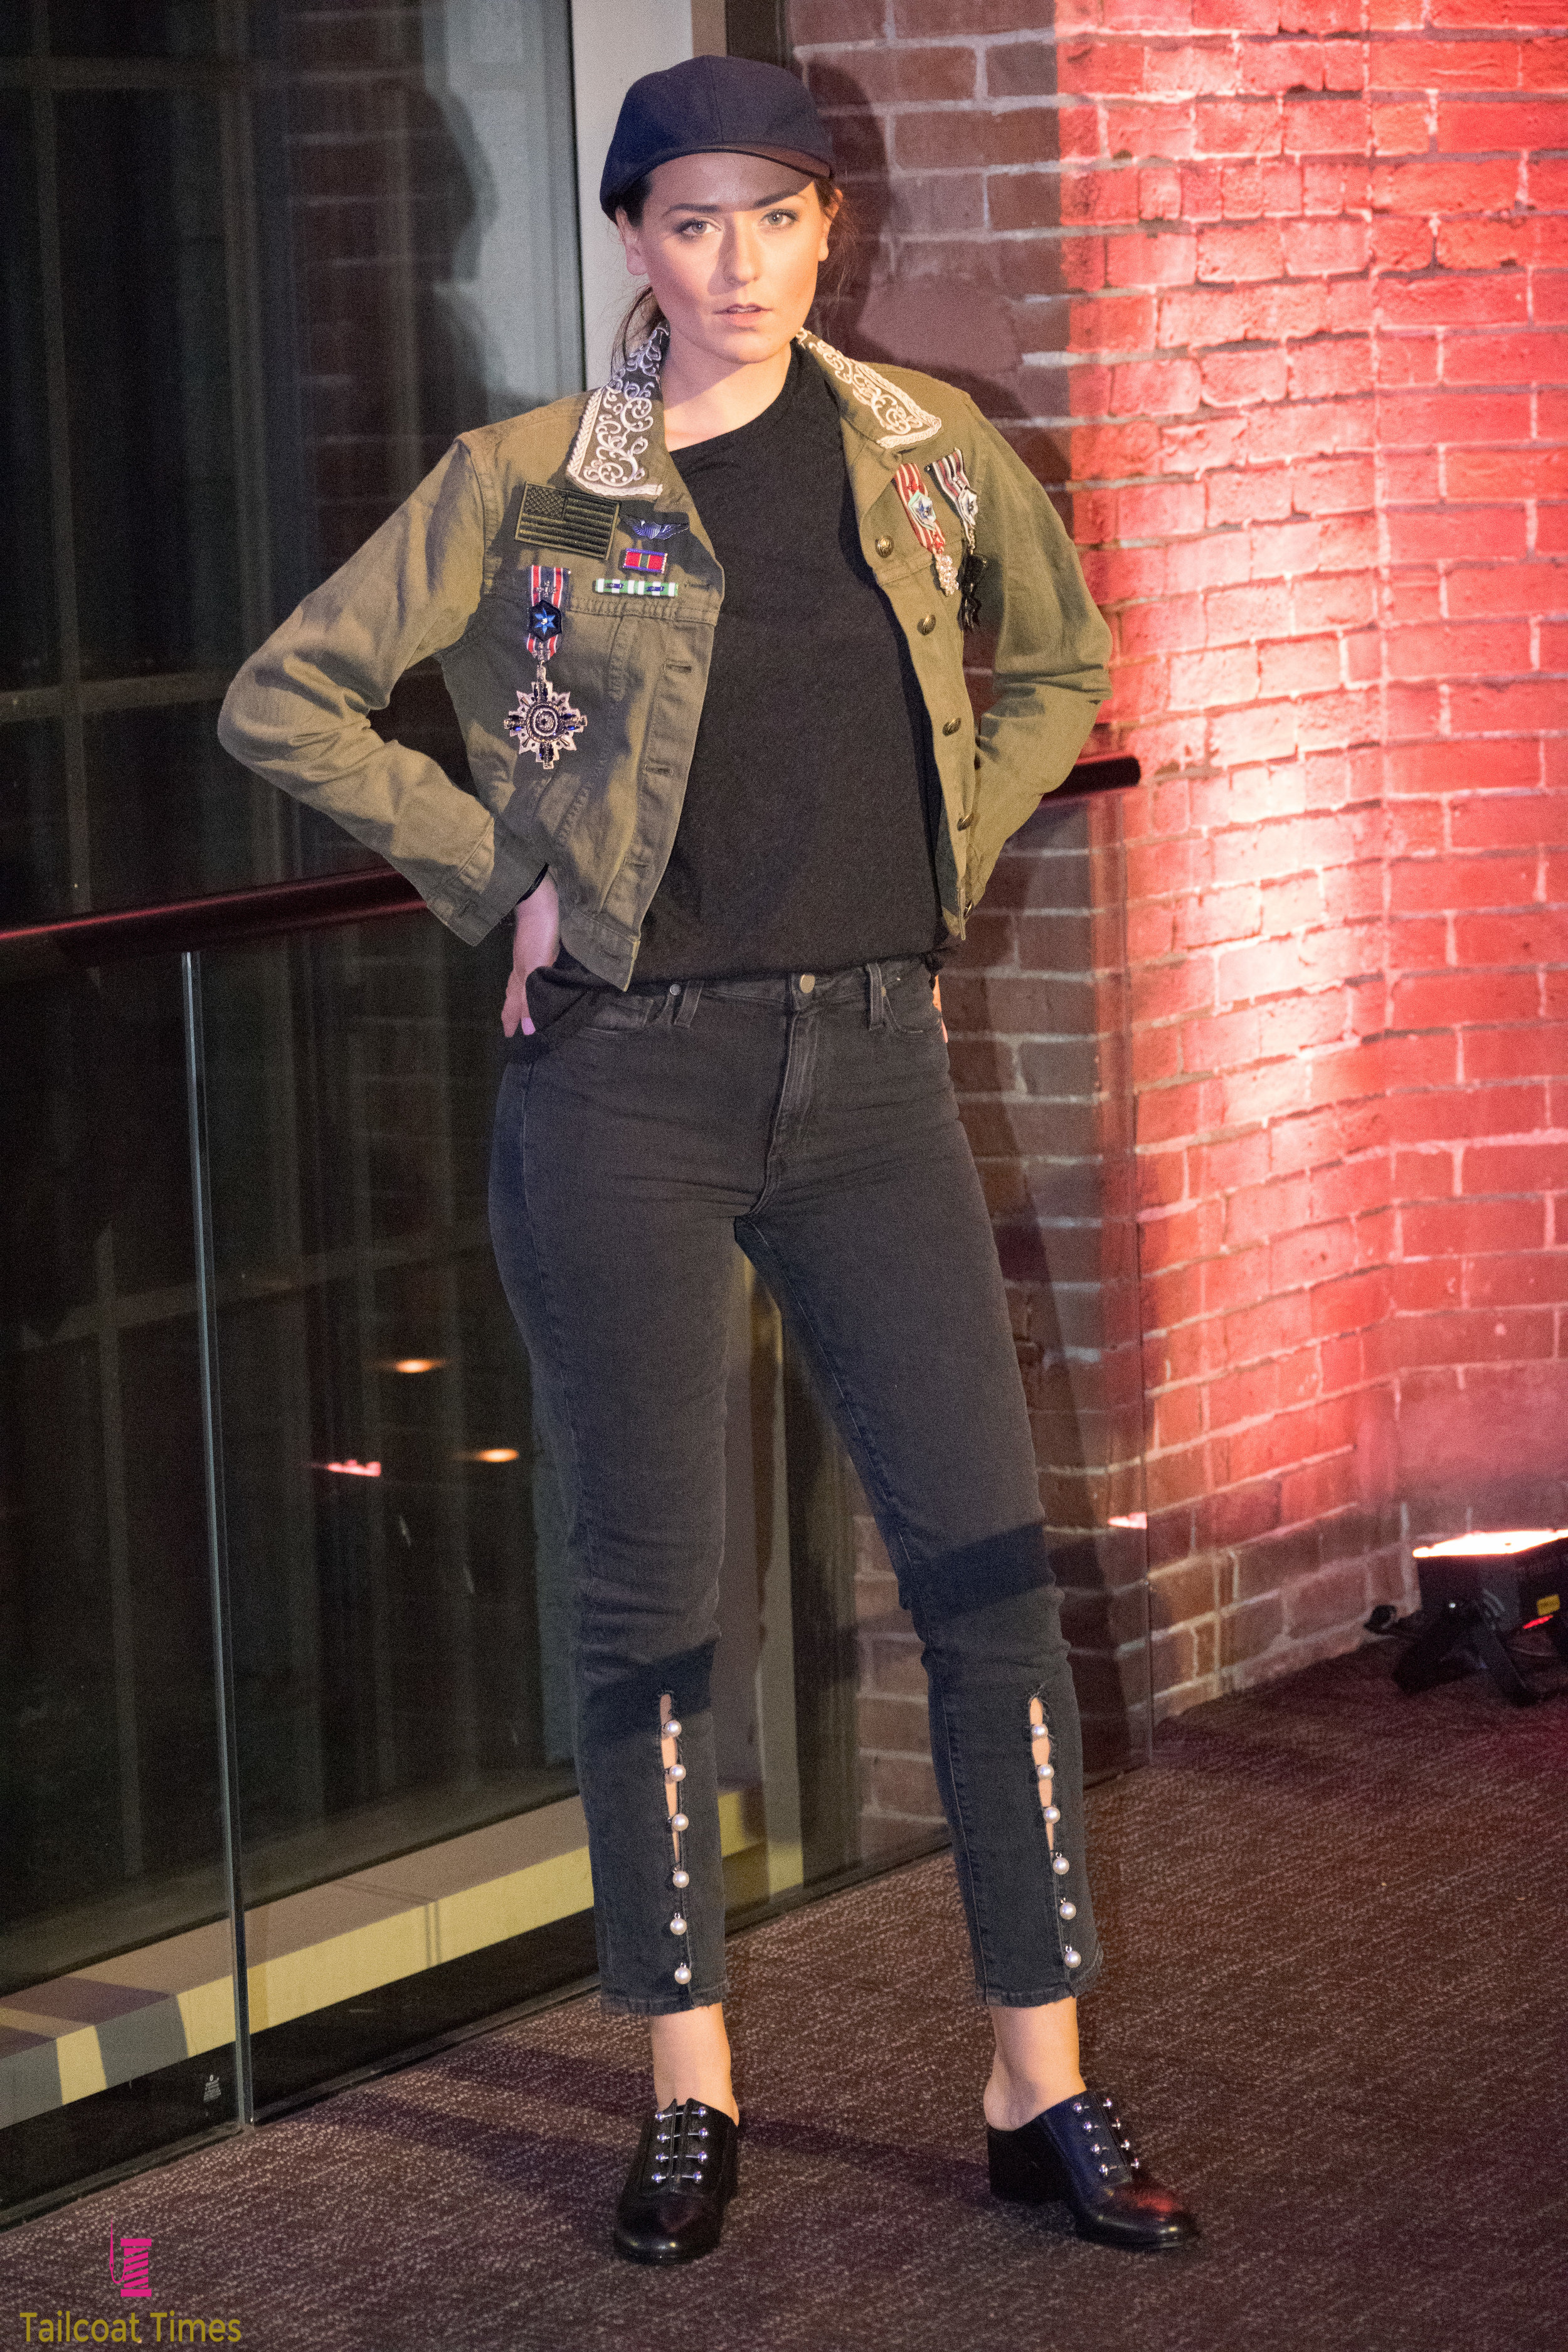 FashionablyLate_TrunkShow_Tailcoat Times (28 of 48).jpg